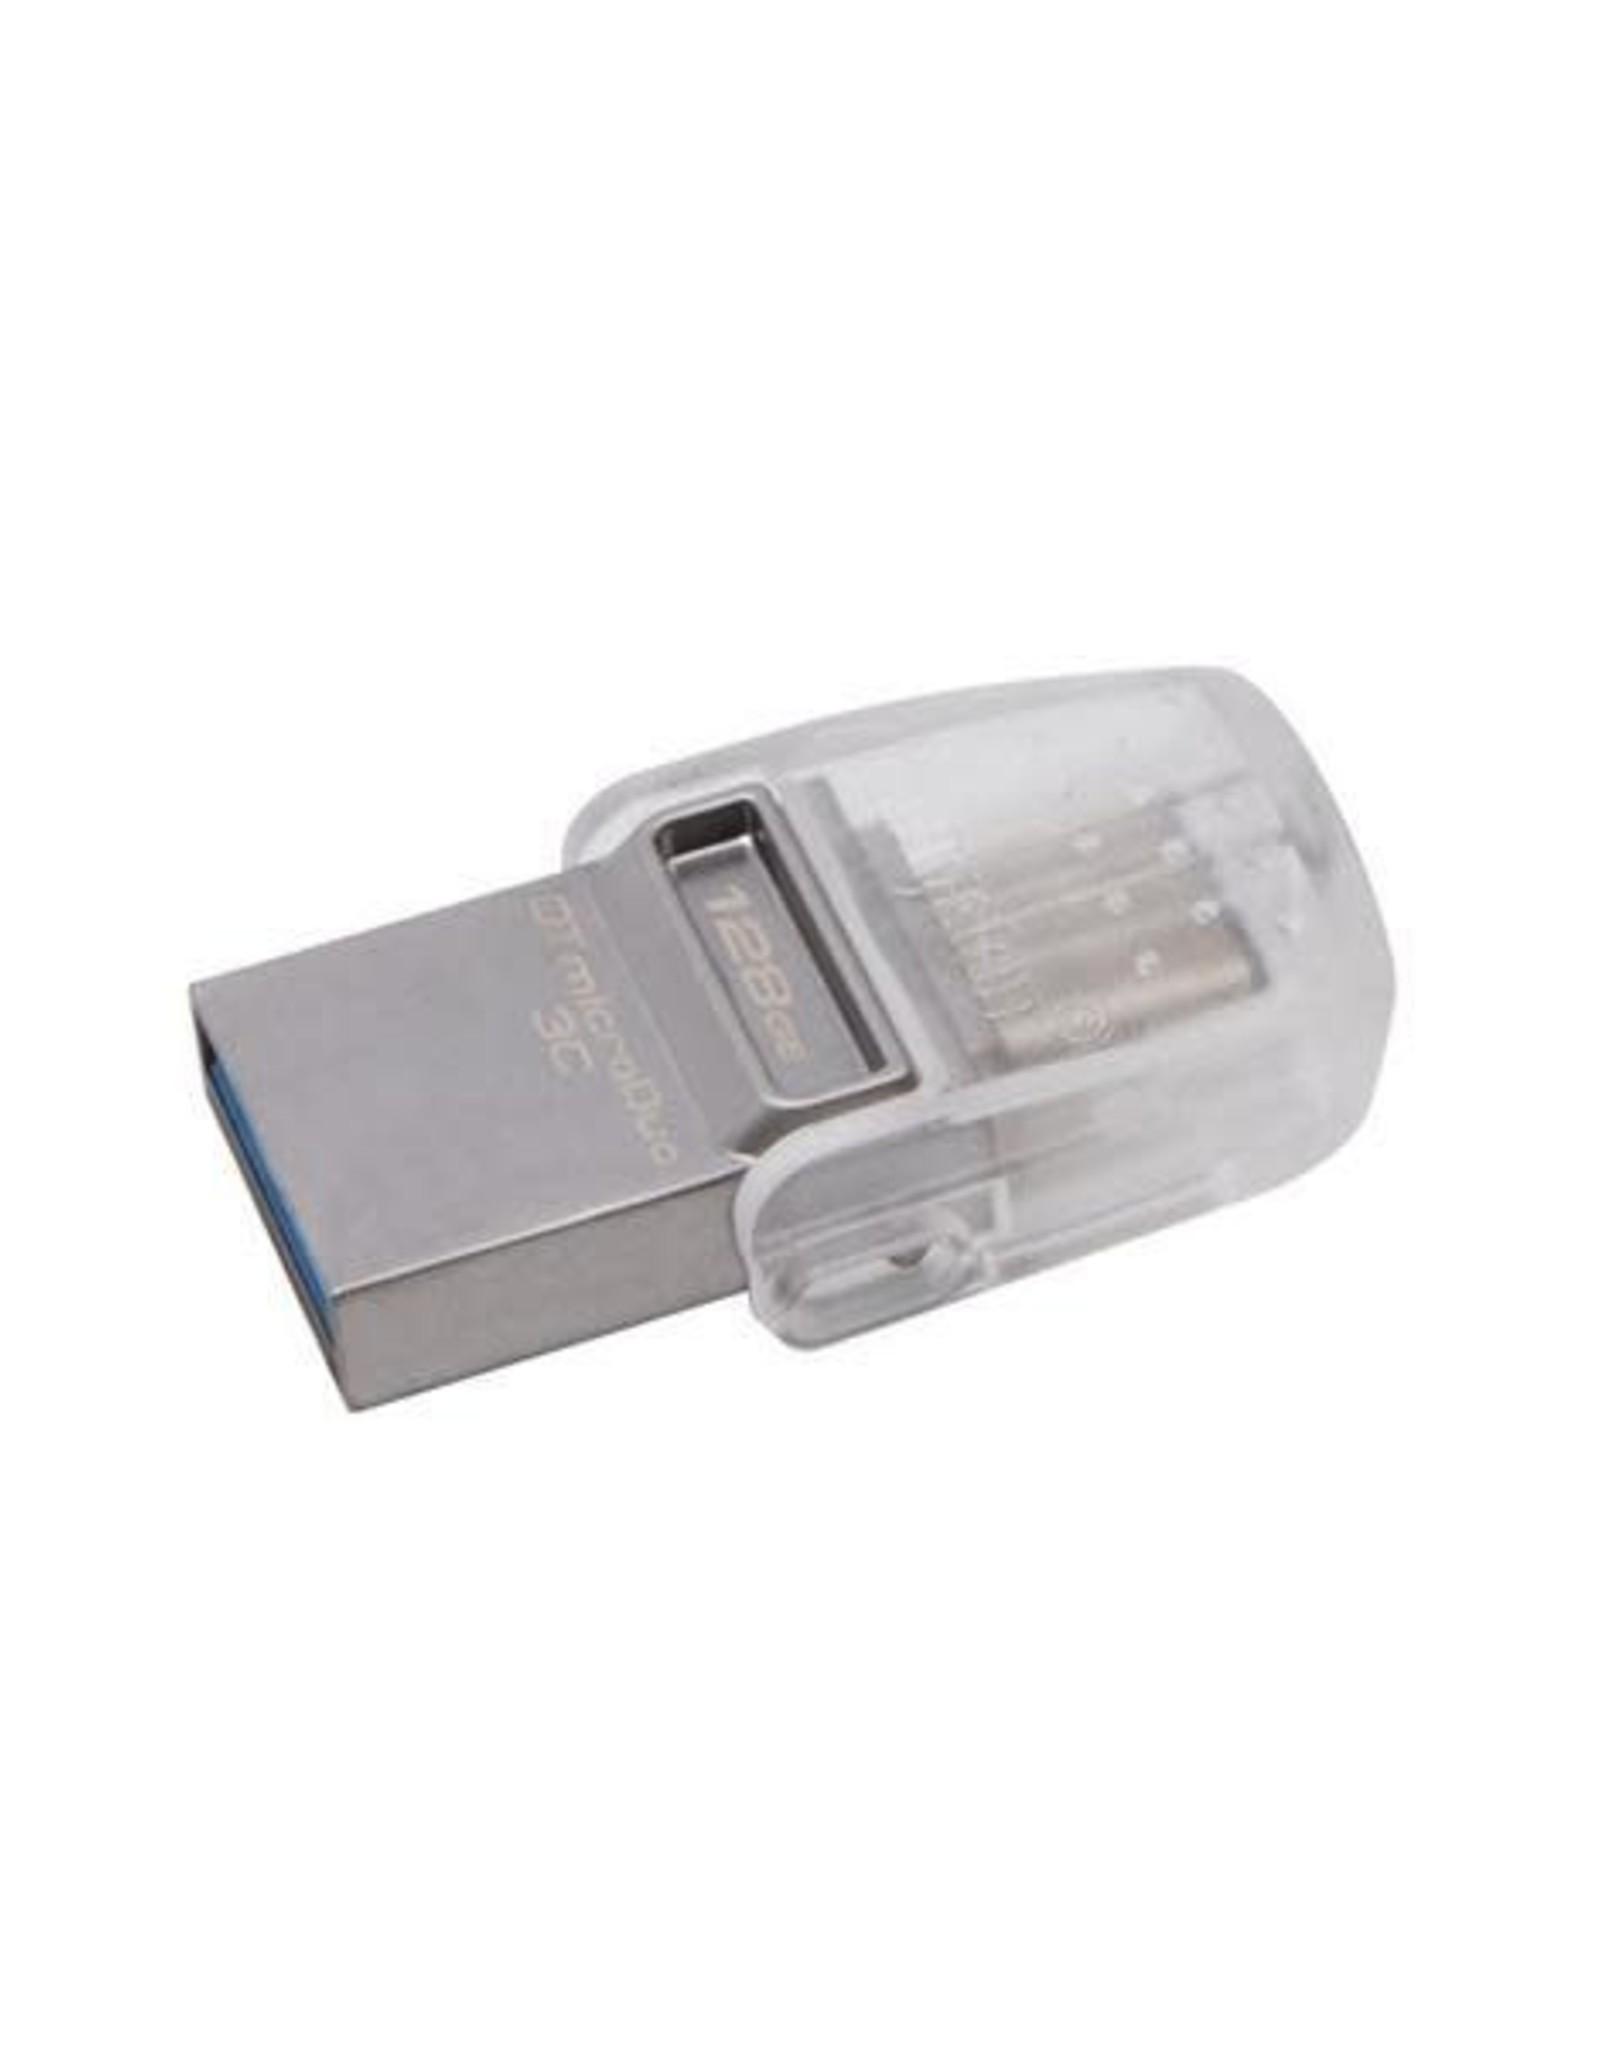 Kingston Kingston   128GB DT MICRODUO USB C DTDUO3C/128GBCR